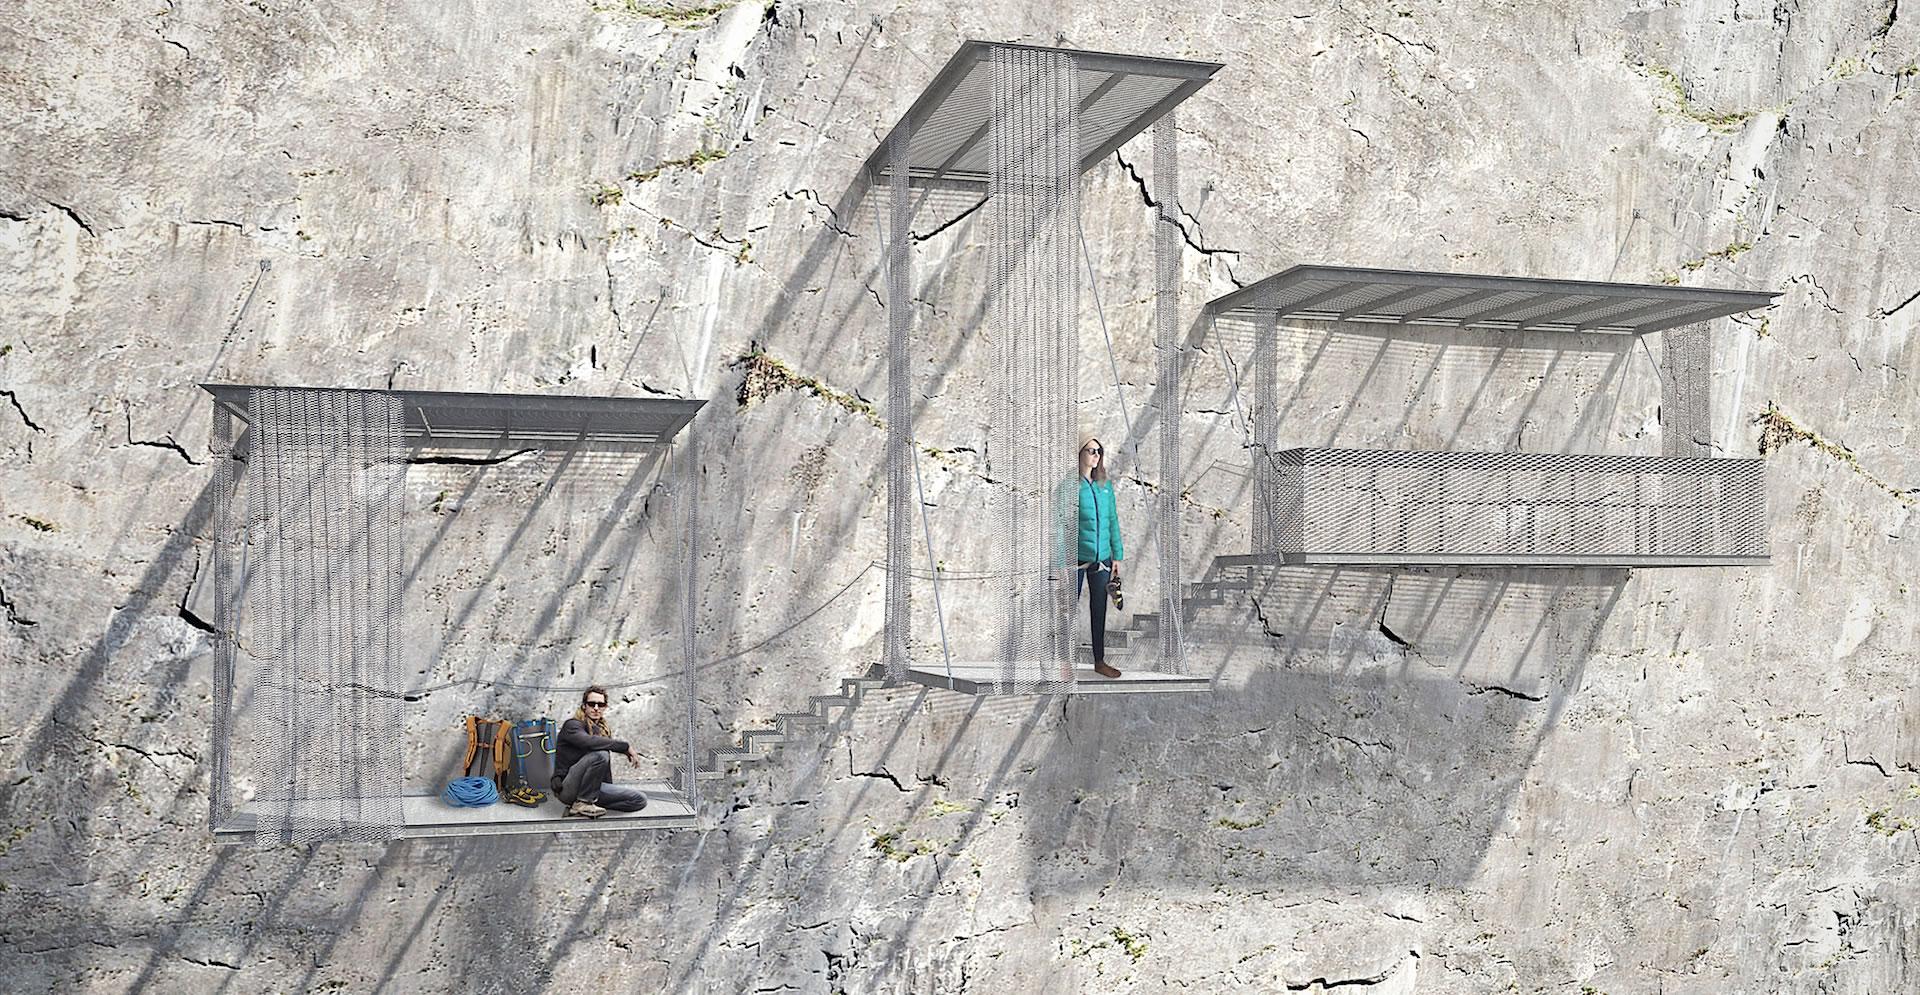 christophe-benichou-architectures-balcons-verdon-balconies-01